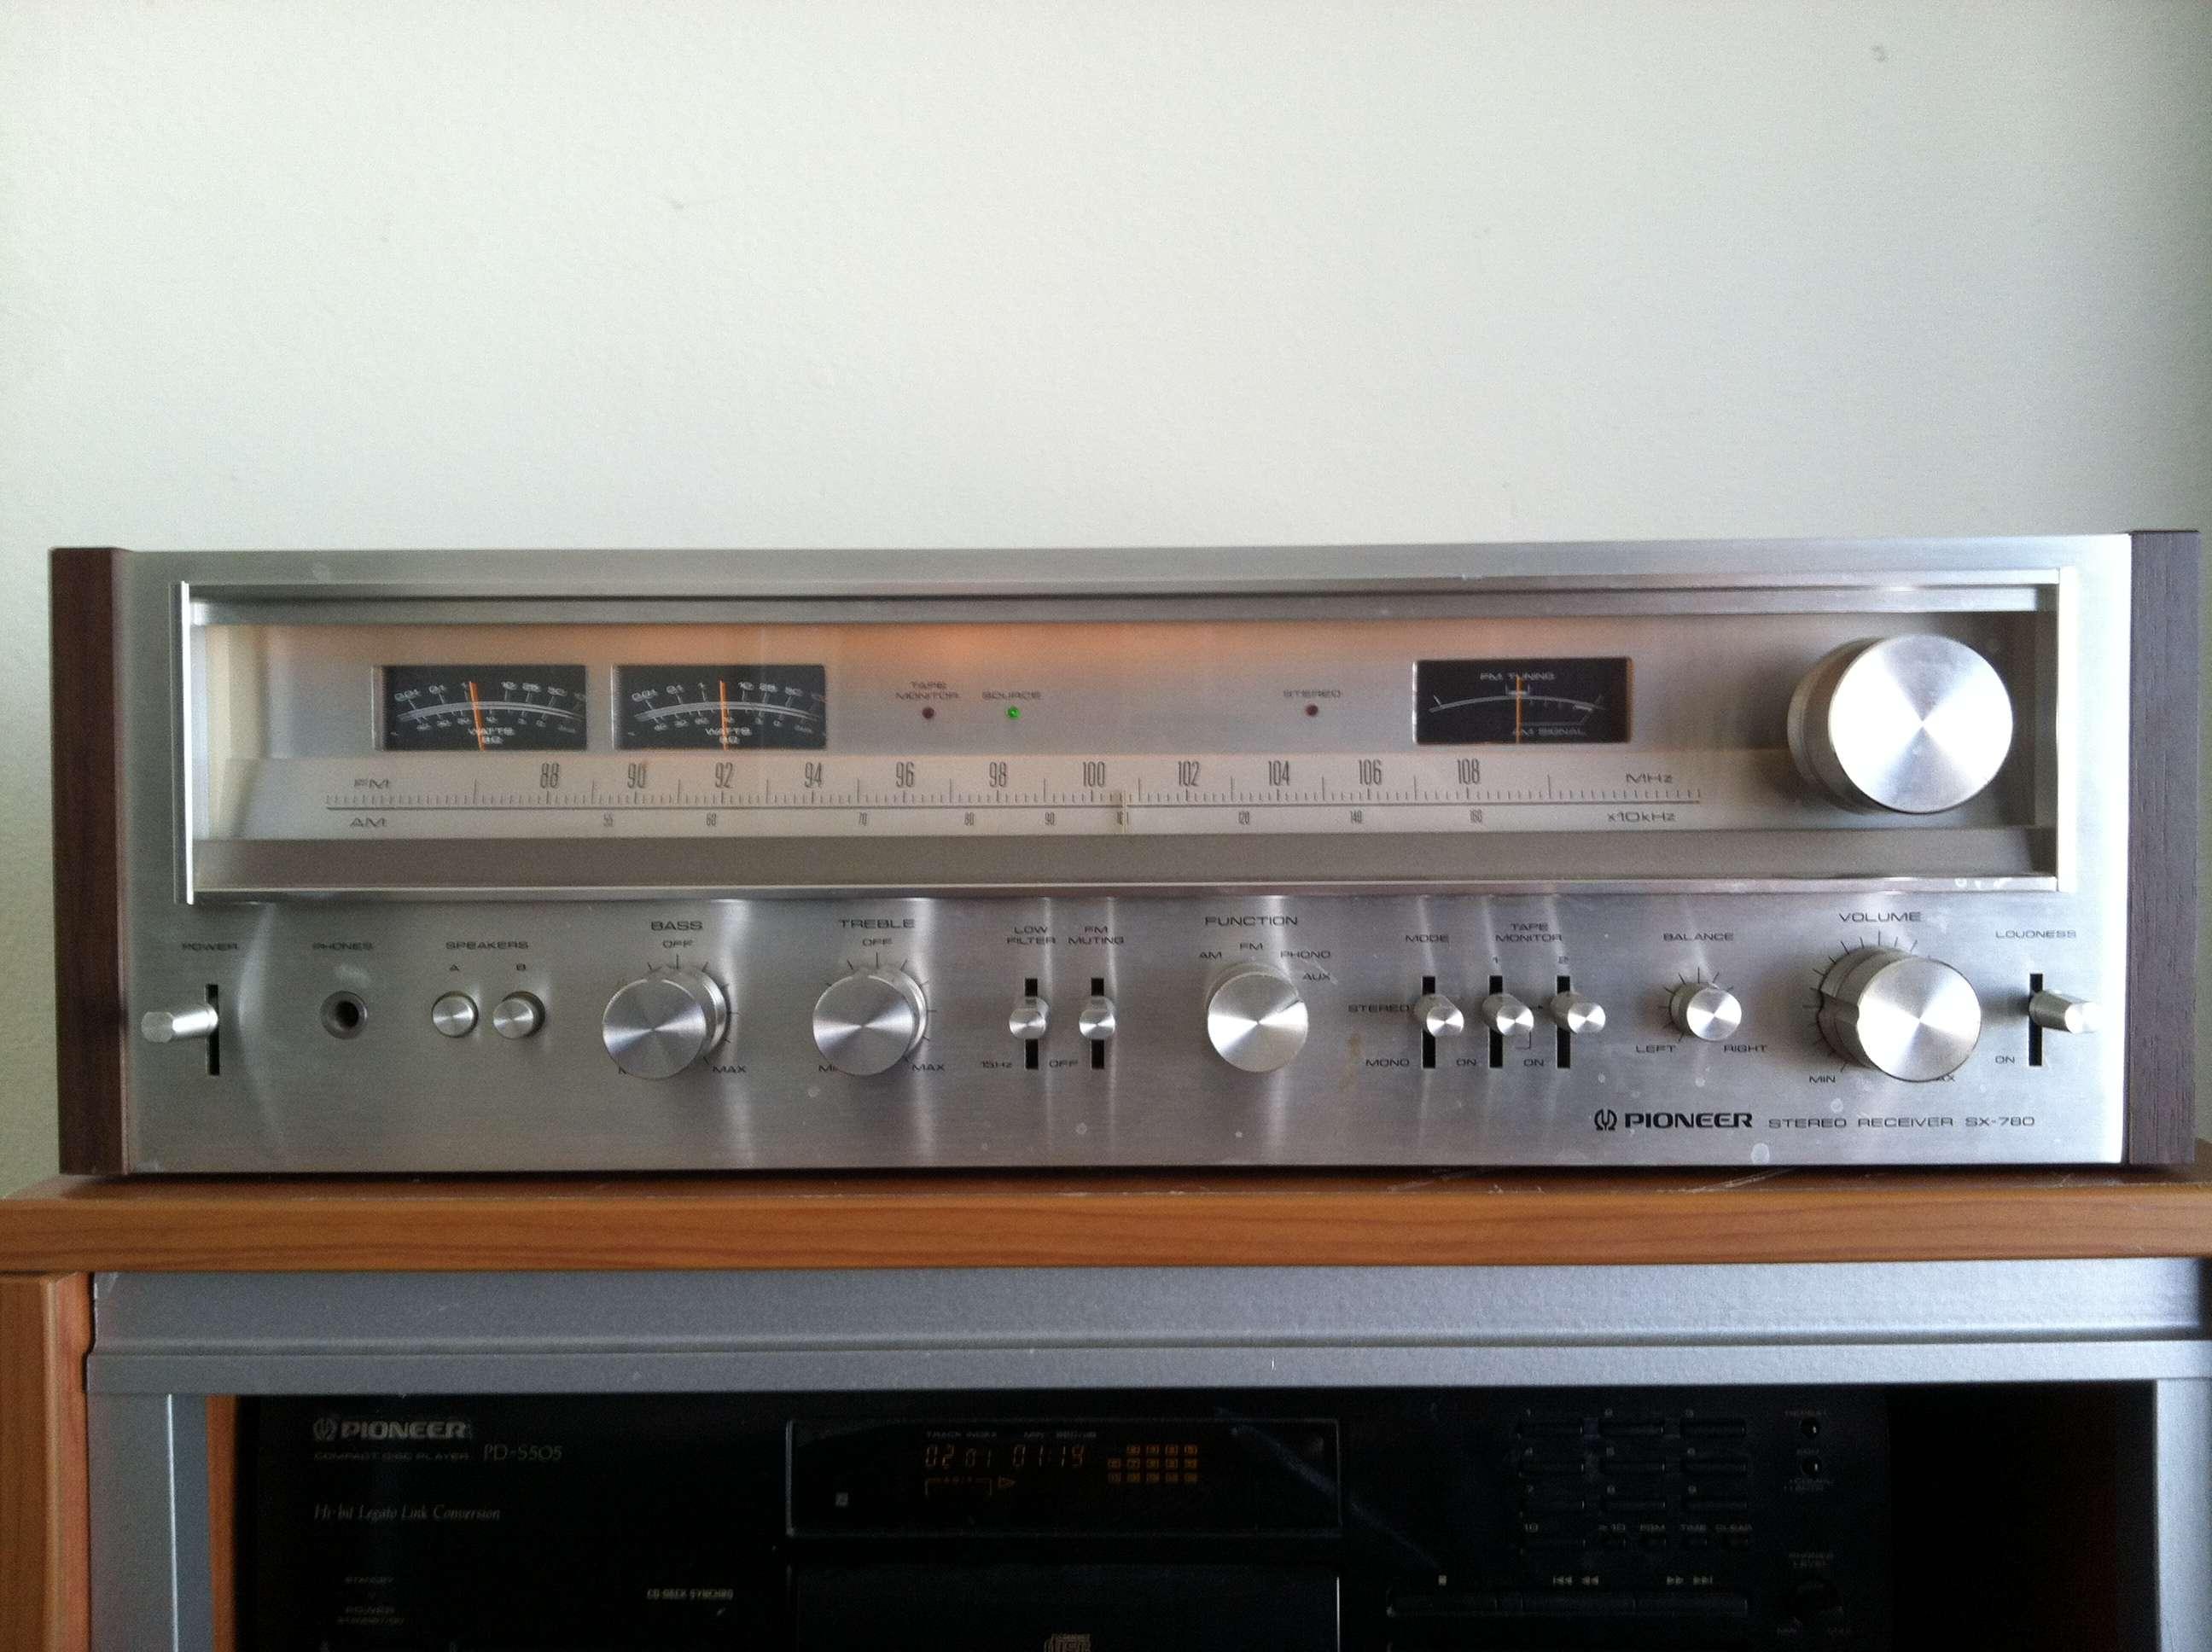 Pioneer SX-780 Receiver  Any good? | Audiokarma Home Audio